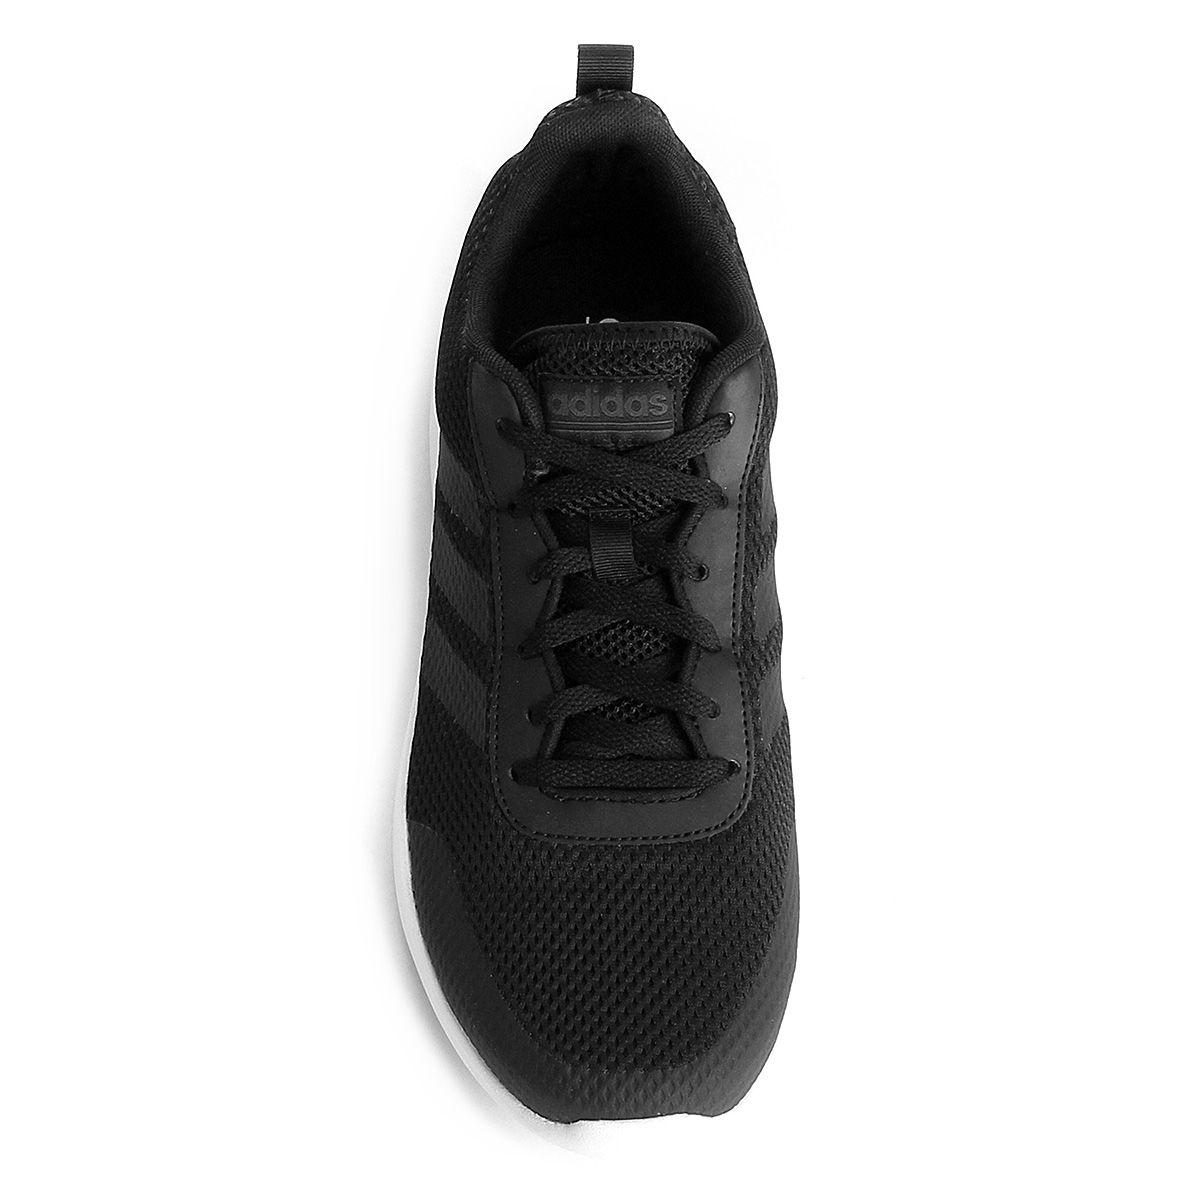 Tênis Adidas Element Race Maculino Preto e Branco